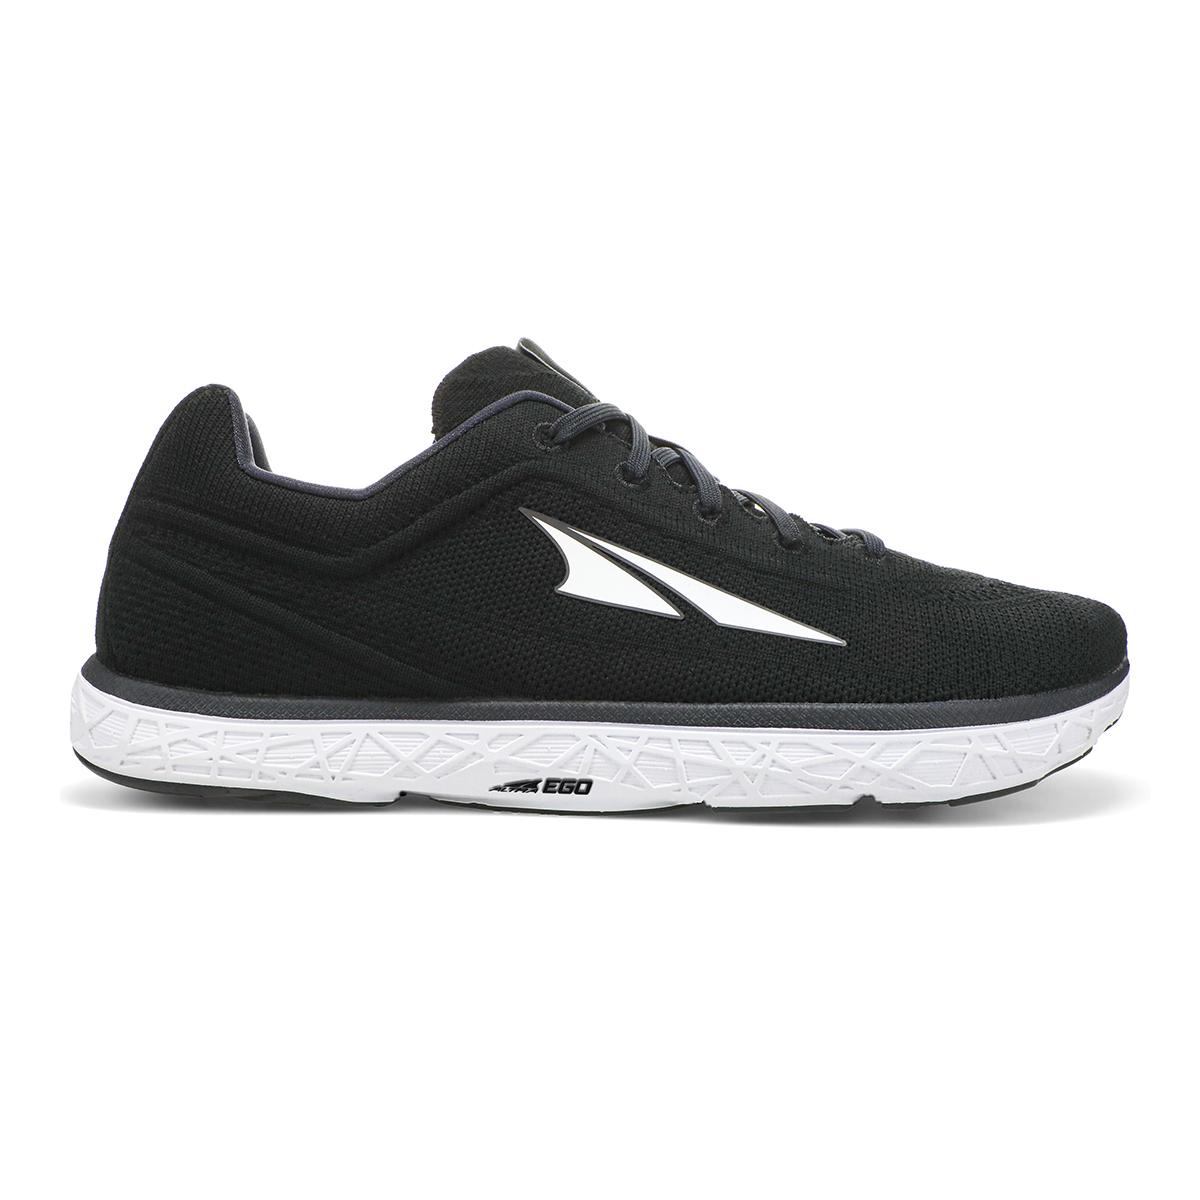 Women's Altra Escalante 2.5 Running Shoe - Color: Black - Size: 10.5 - Width: Regular, Black, large, image 1